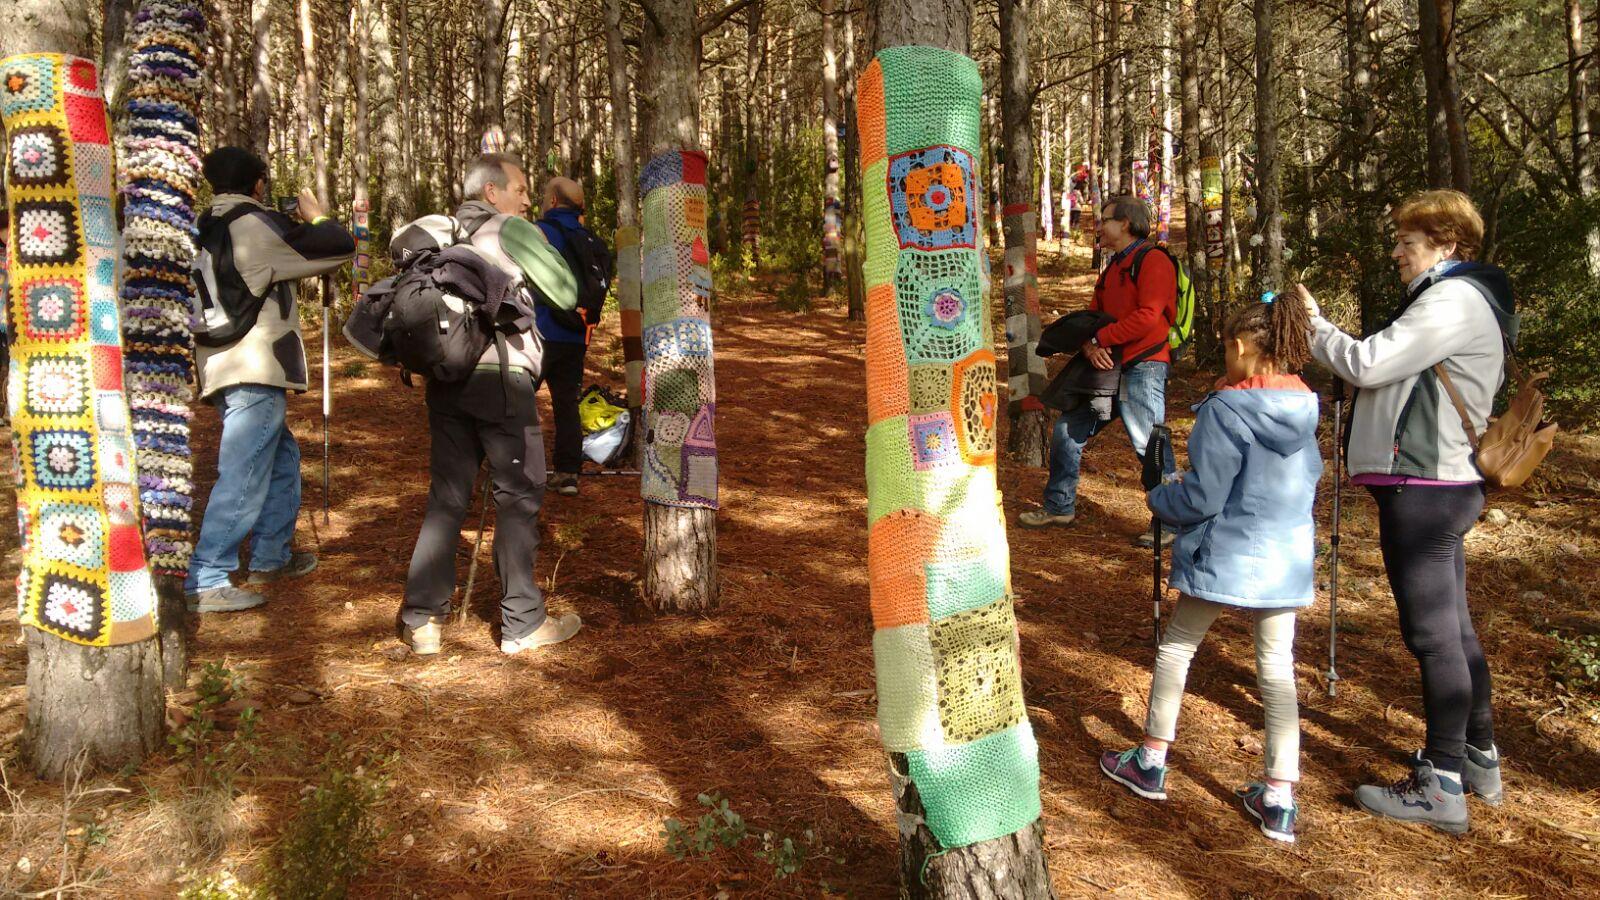 Bosque-Encantado-19.jpg